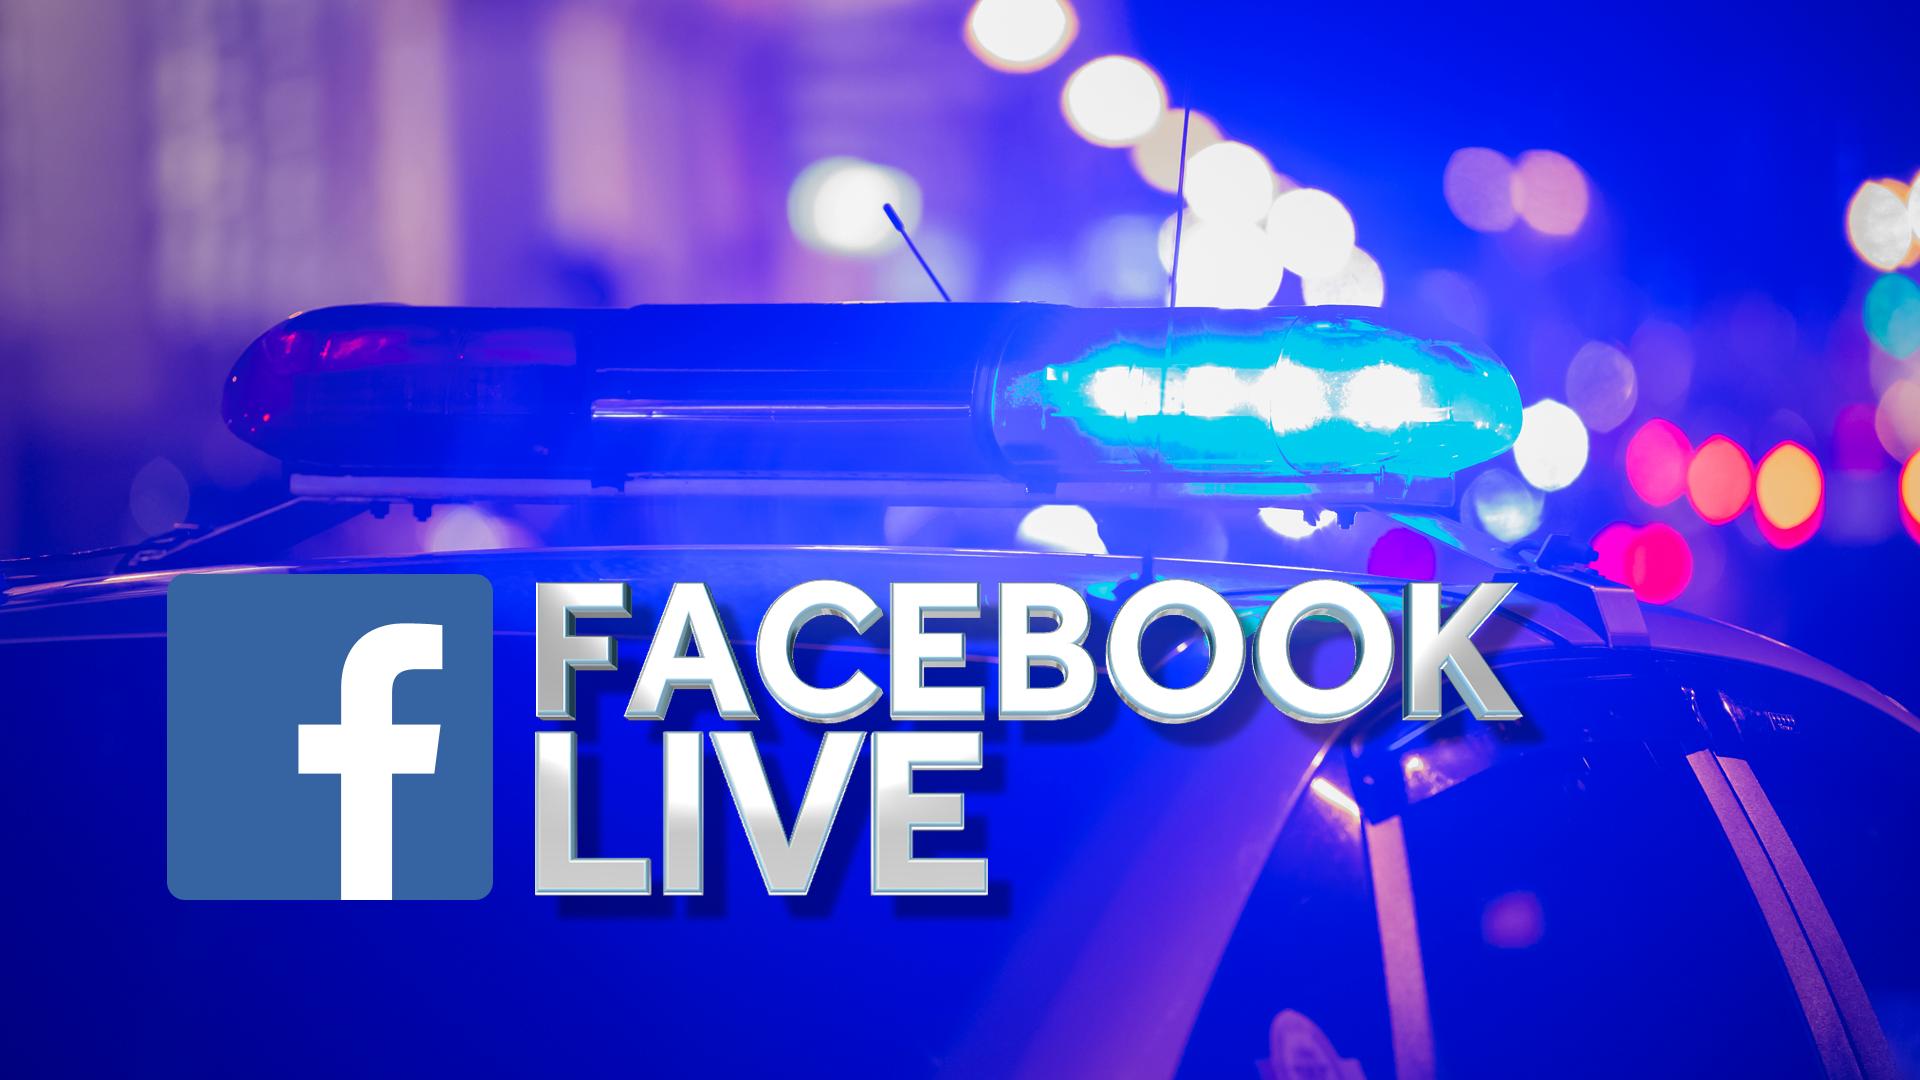 Pennsylvania Teen, 18, Streamed Fatal Car Crash on Facebook Live